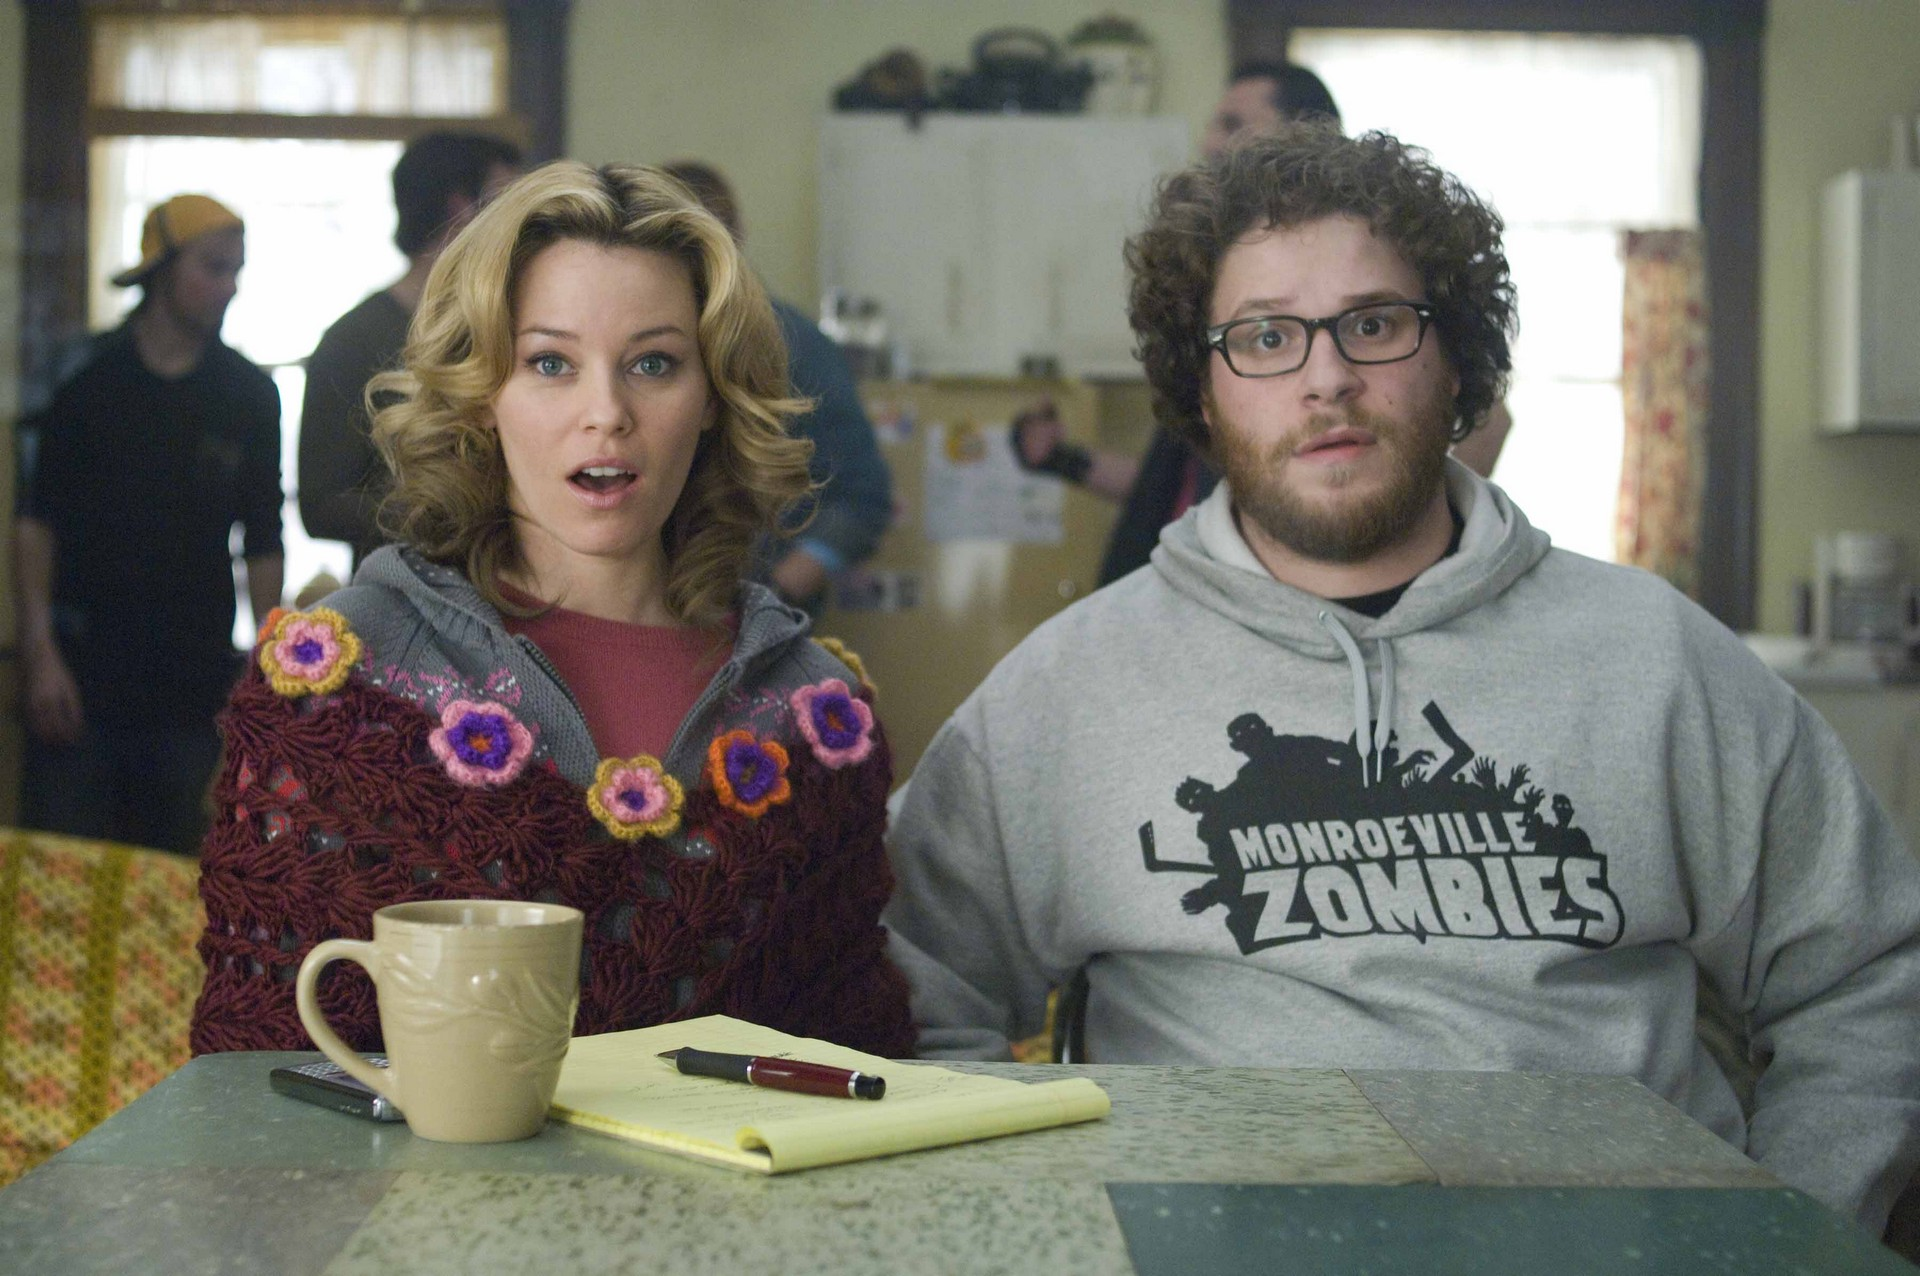 Зак и Мири снимают порно (Zack & Miri Make a Porno), кадр 14.